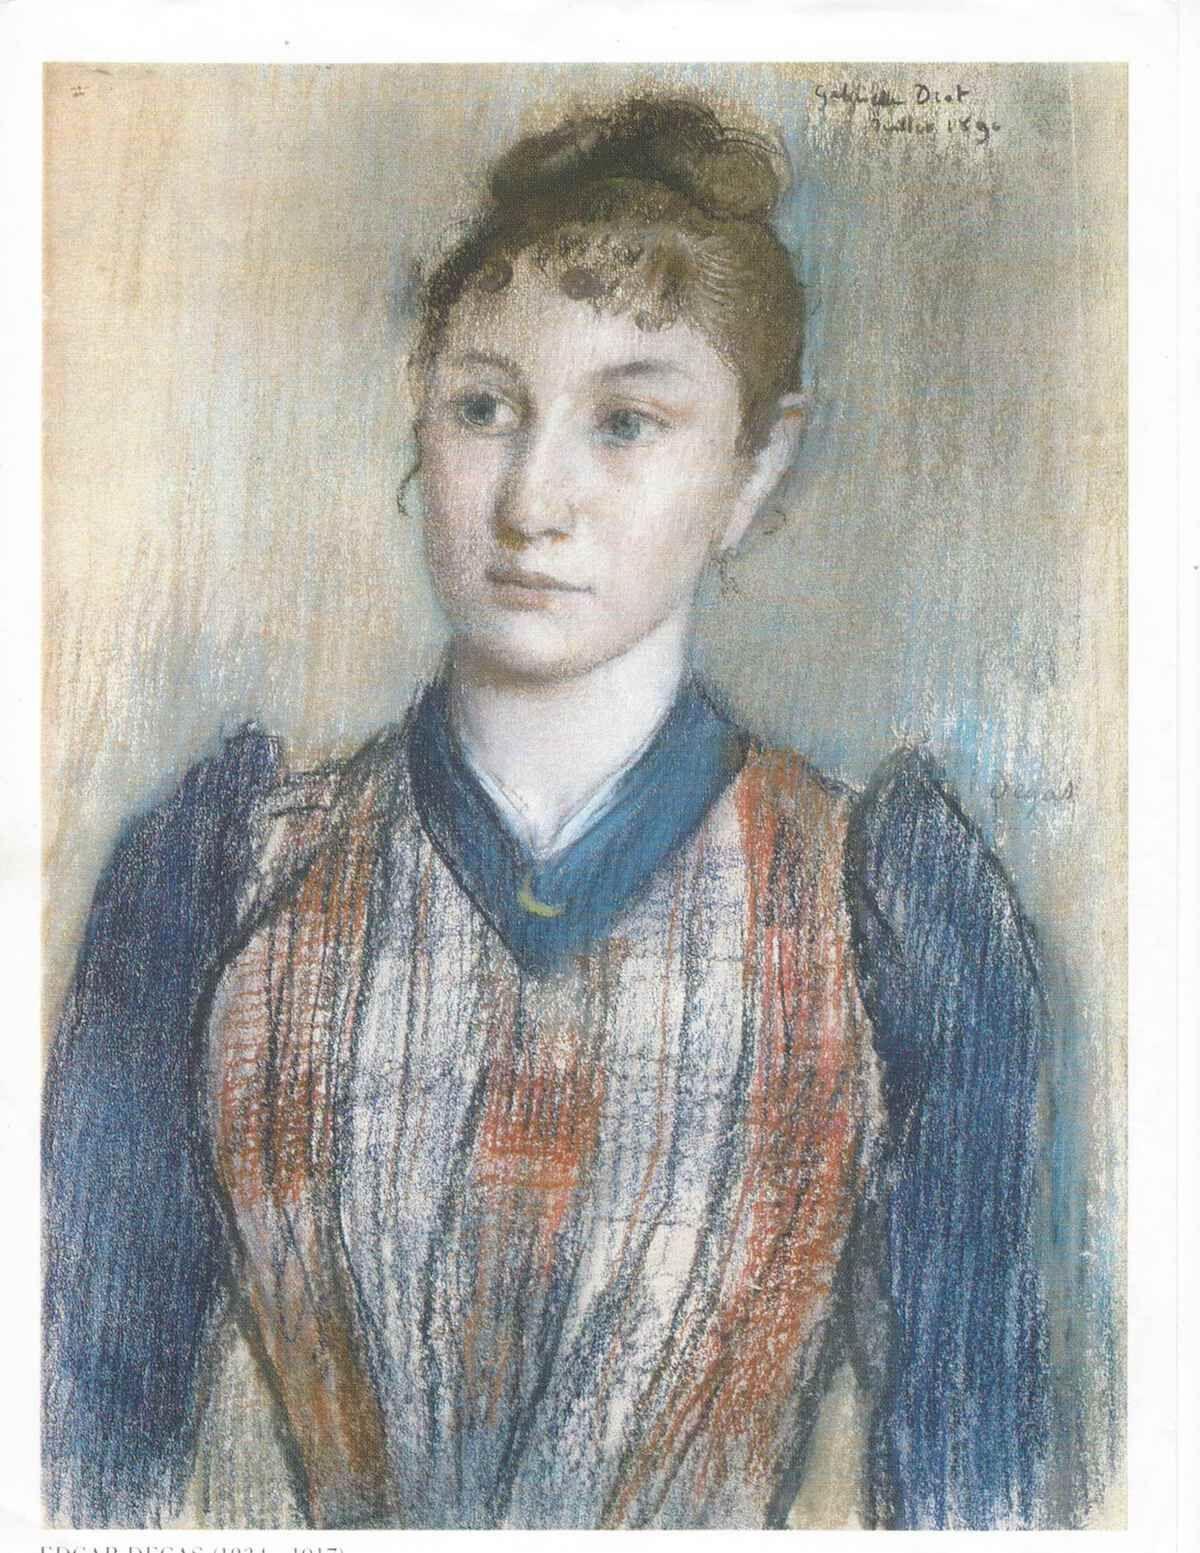 Edgar Degas, Portrait of Mlle. Gabrielle Diot, 1890. Photo courtesy Art Recovery International.